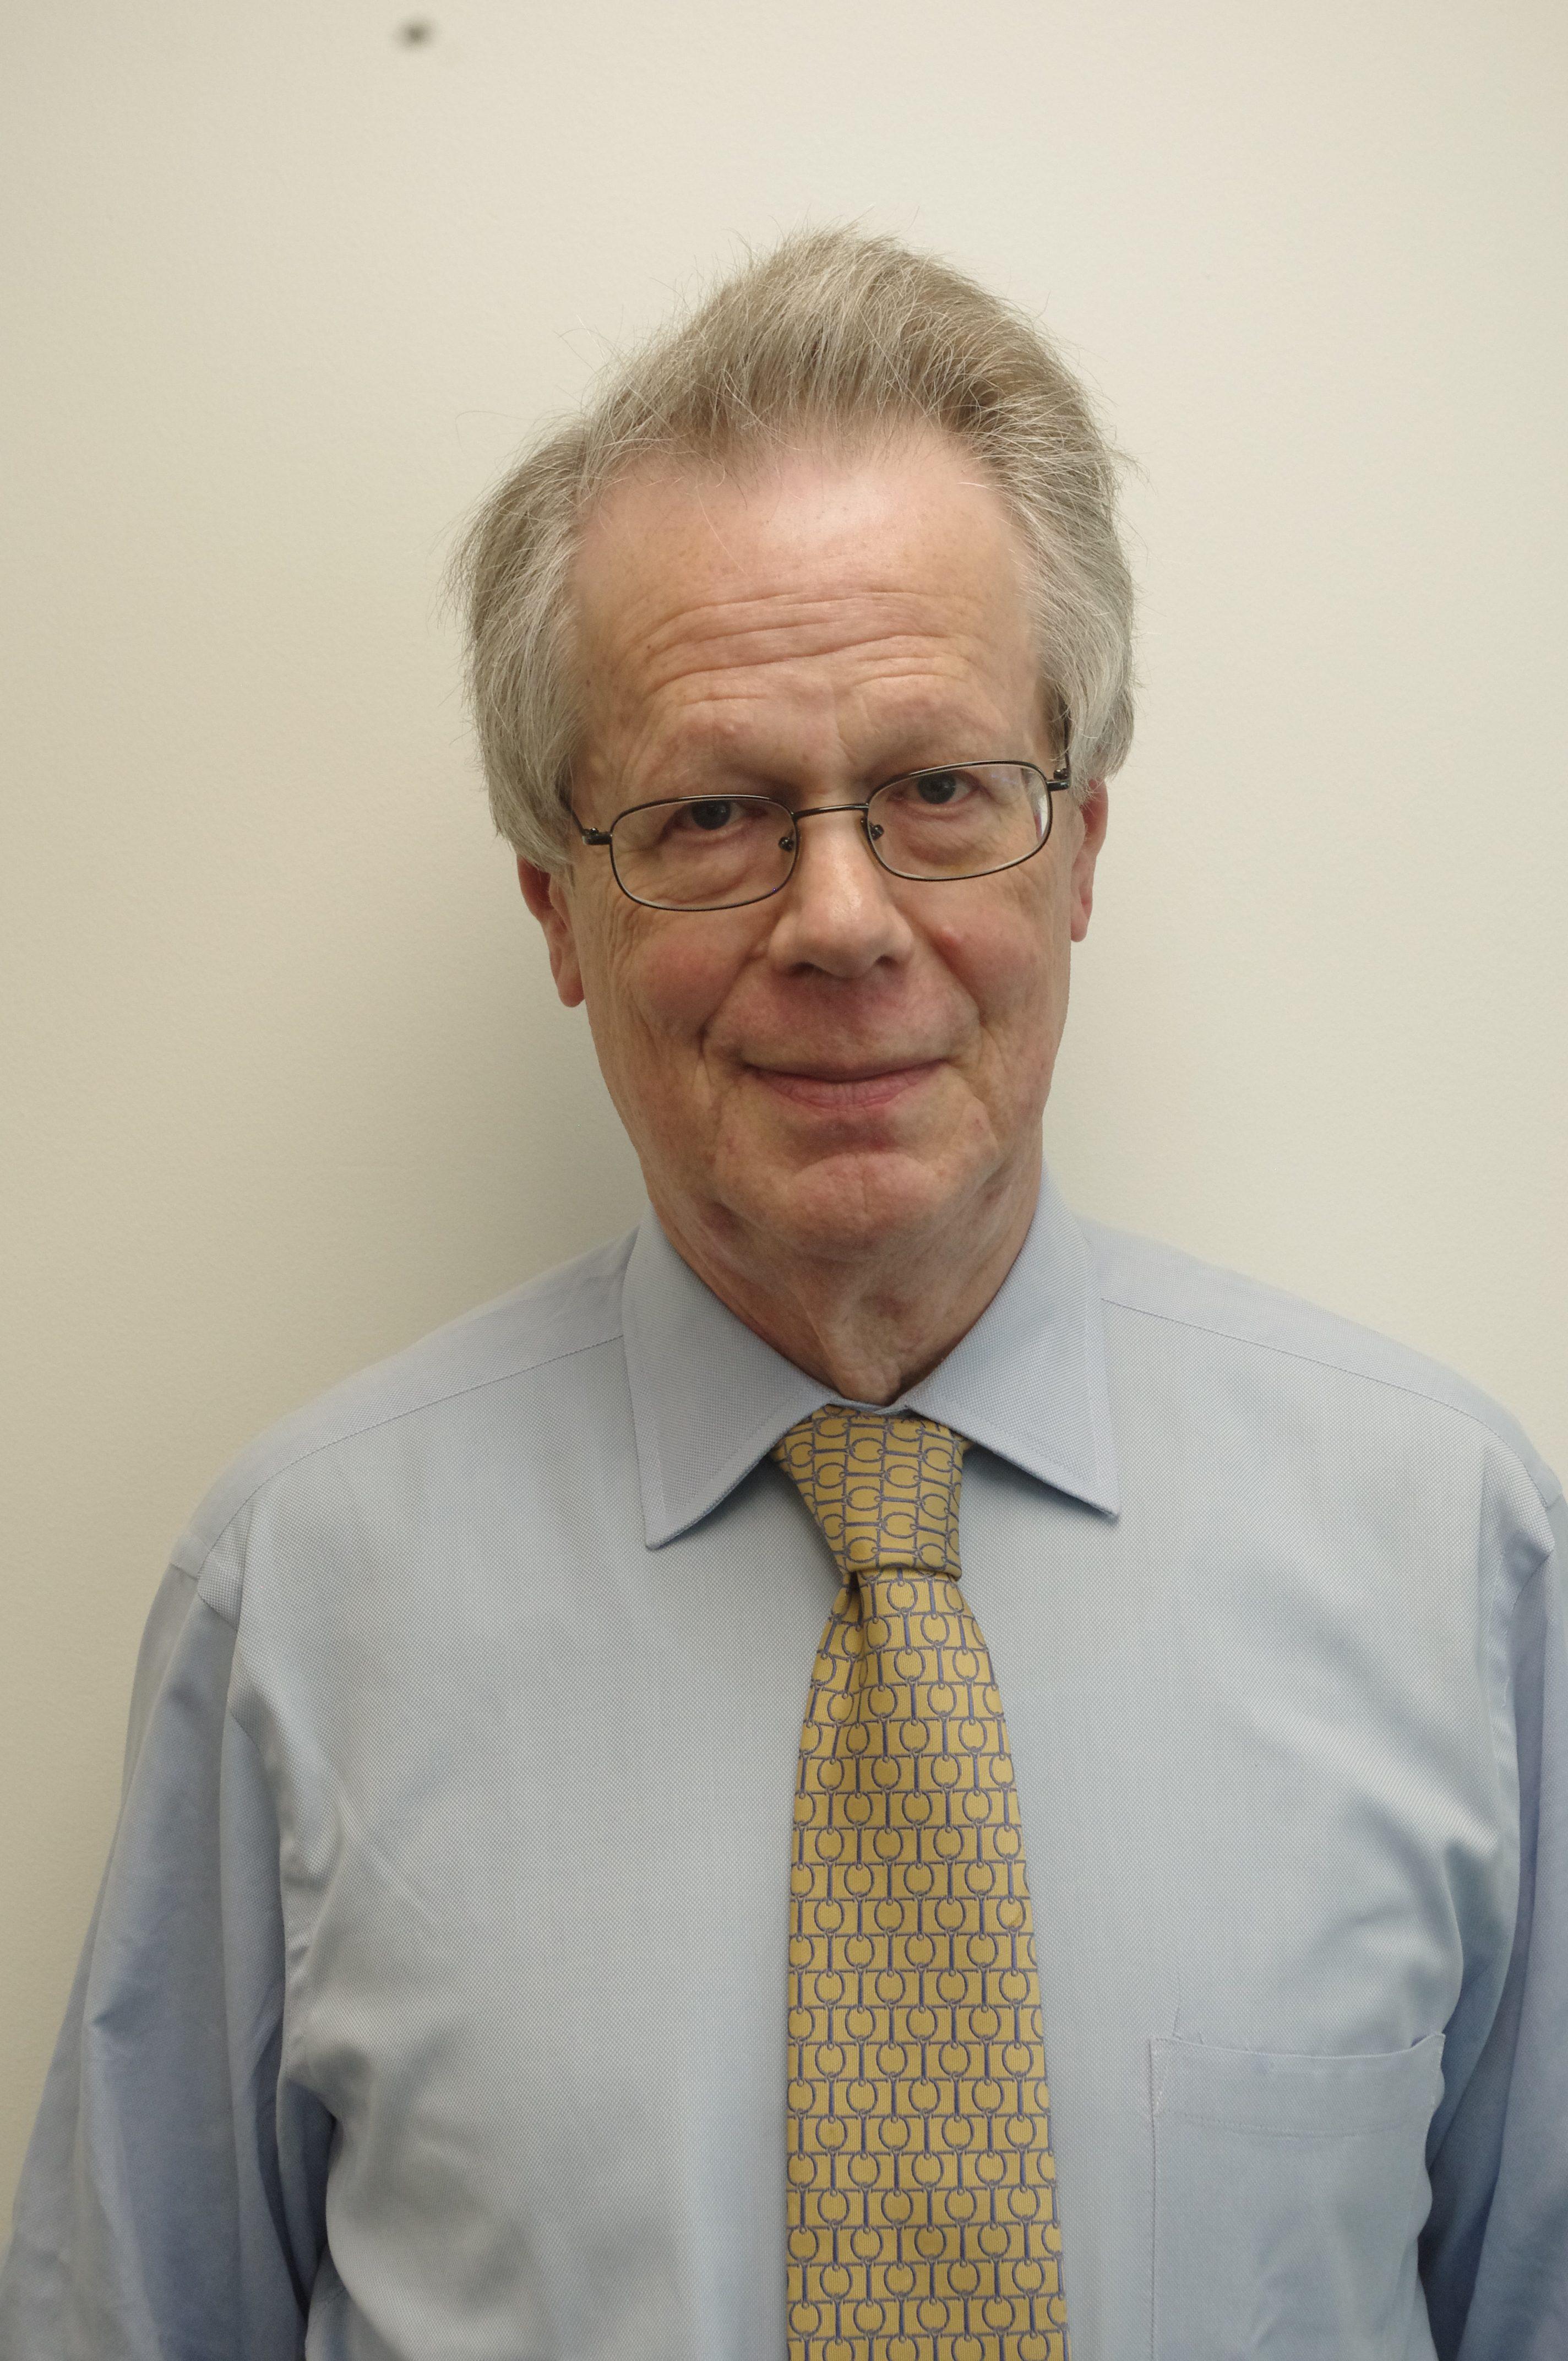 Stephen Lewis